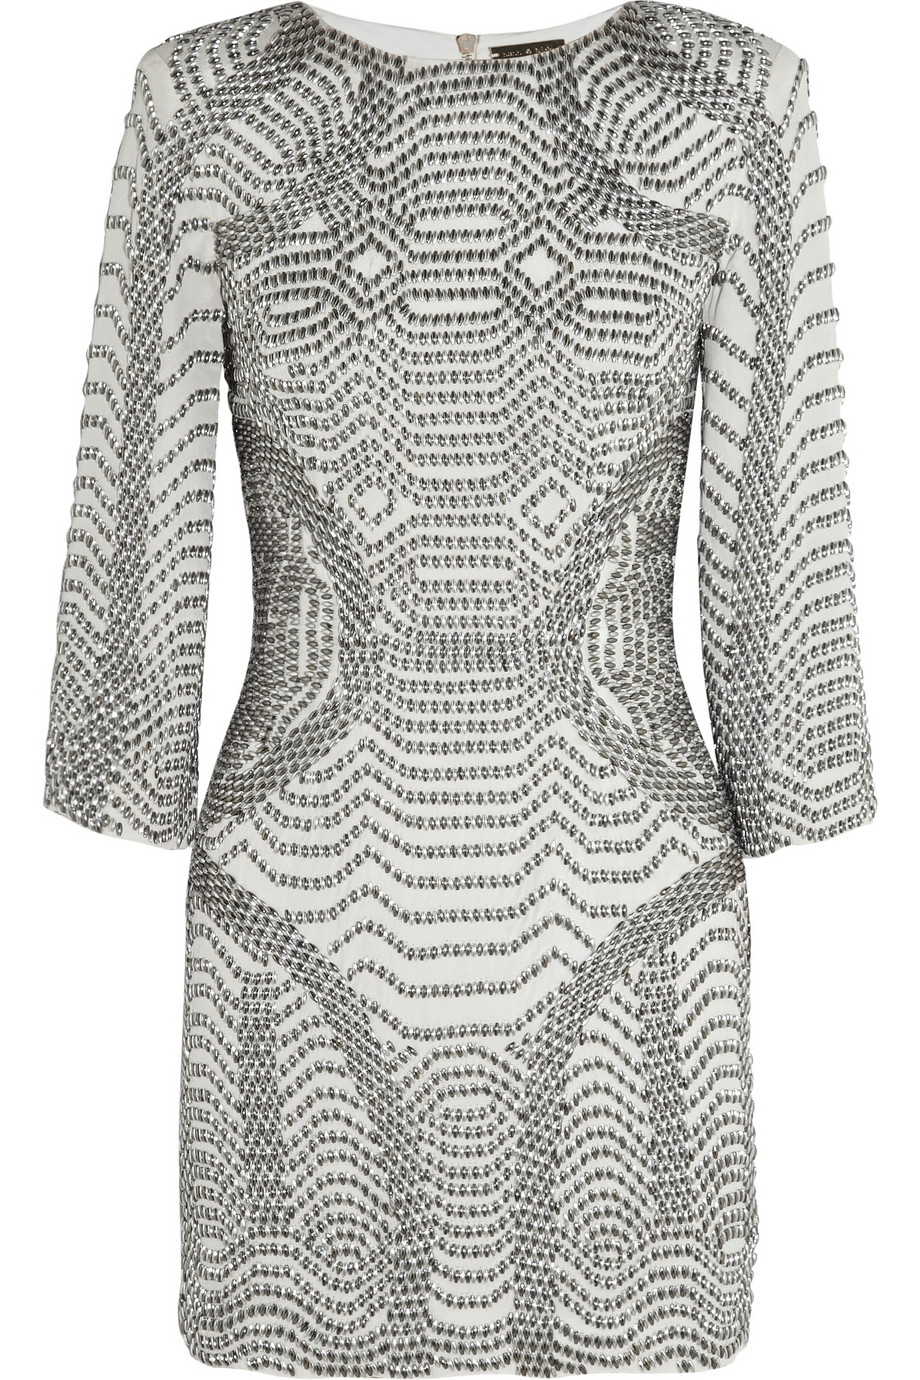 sass bide here now beaded silk mini dress in gray lyst